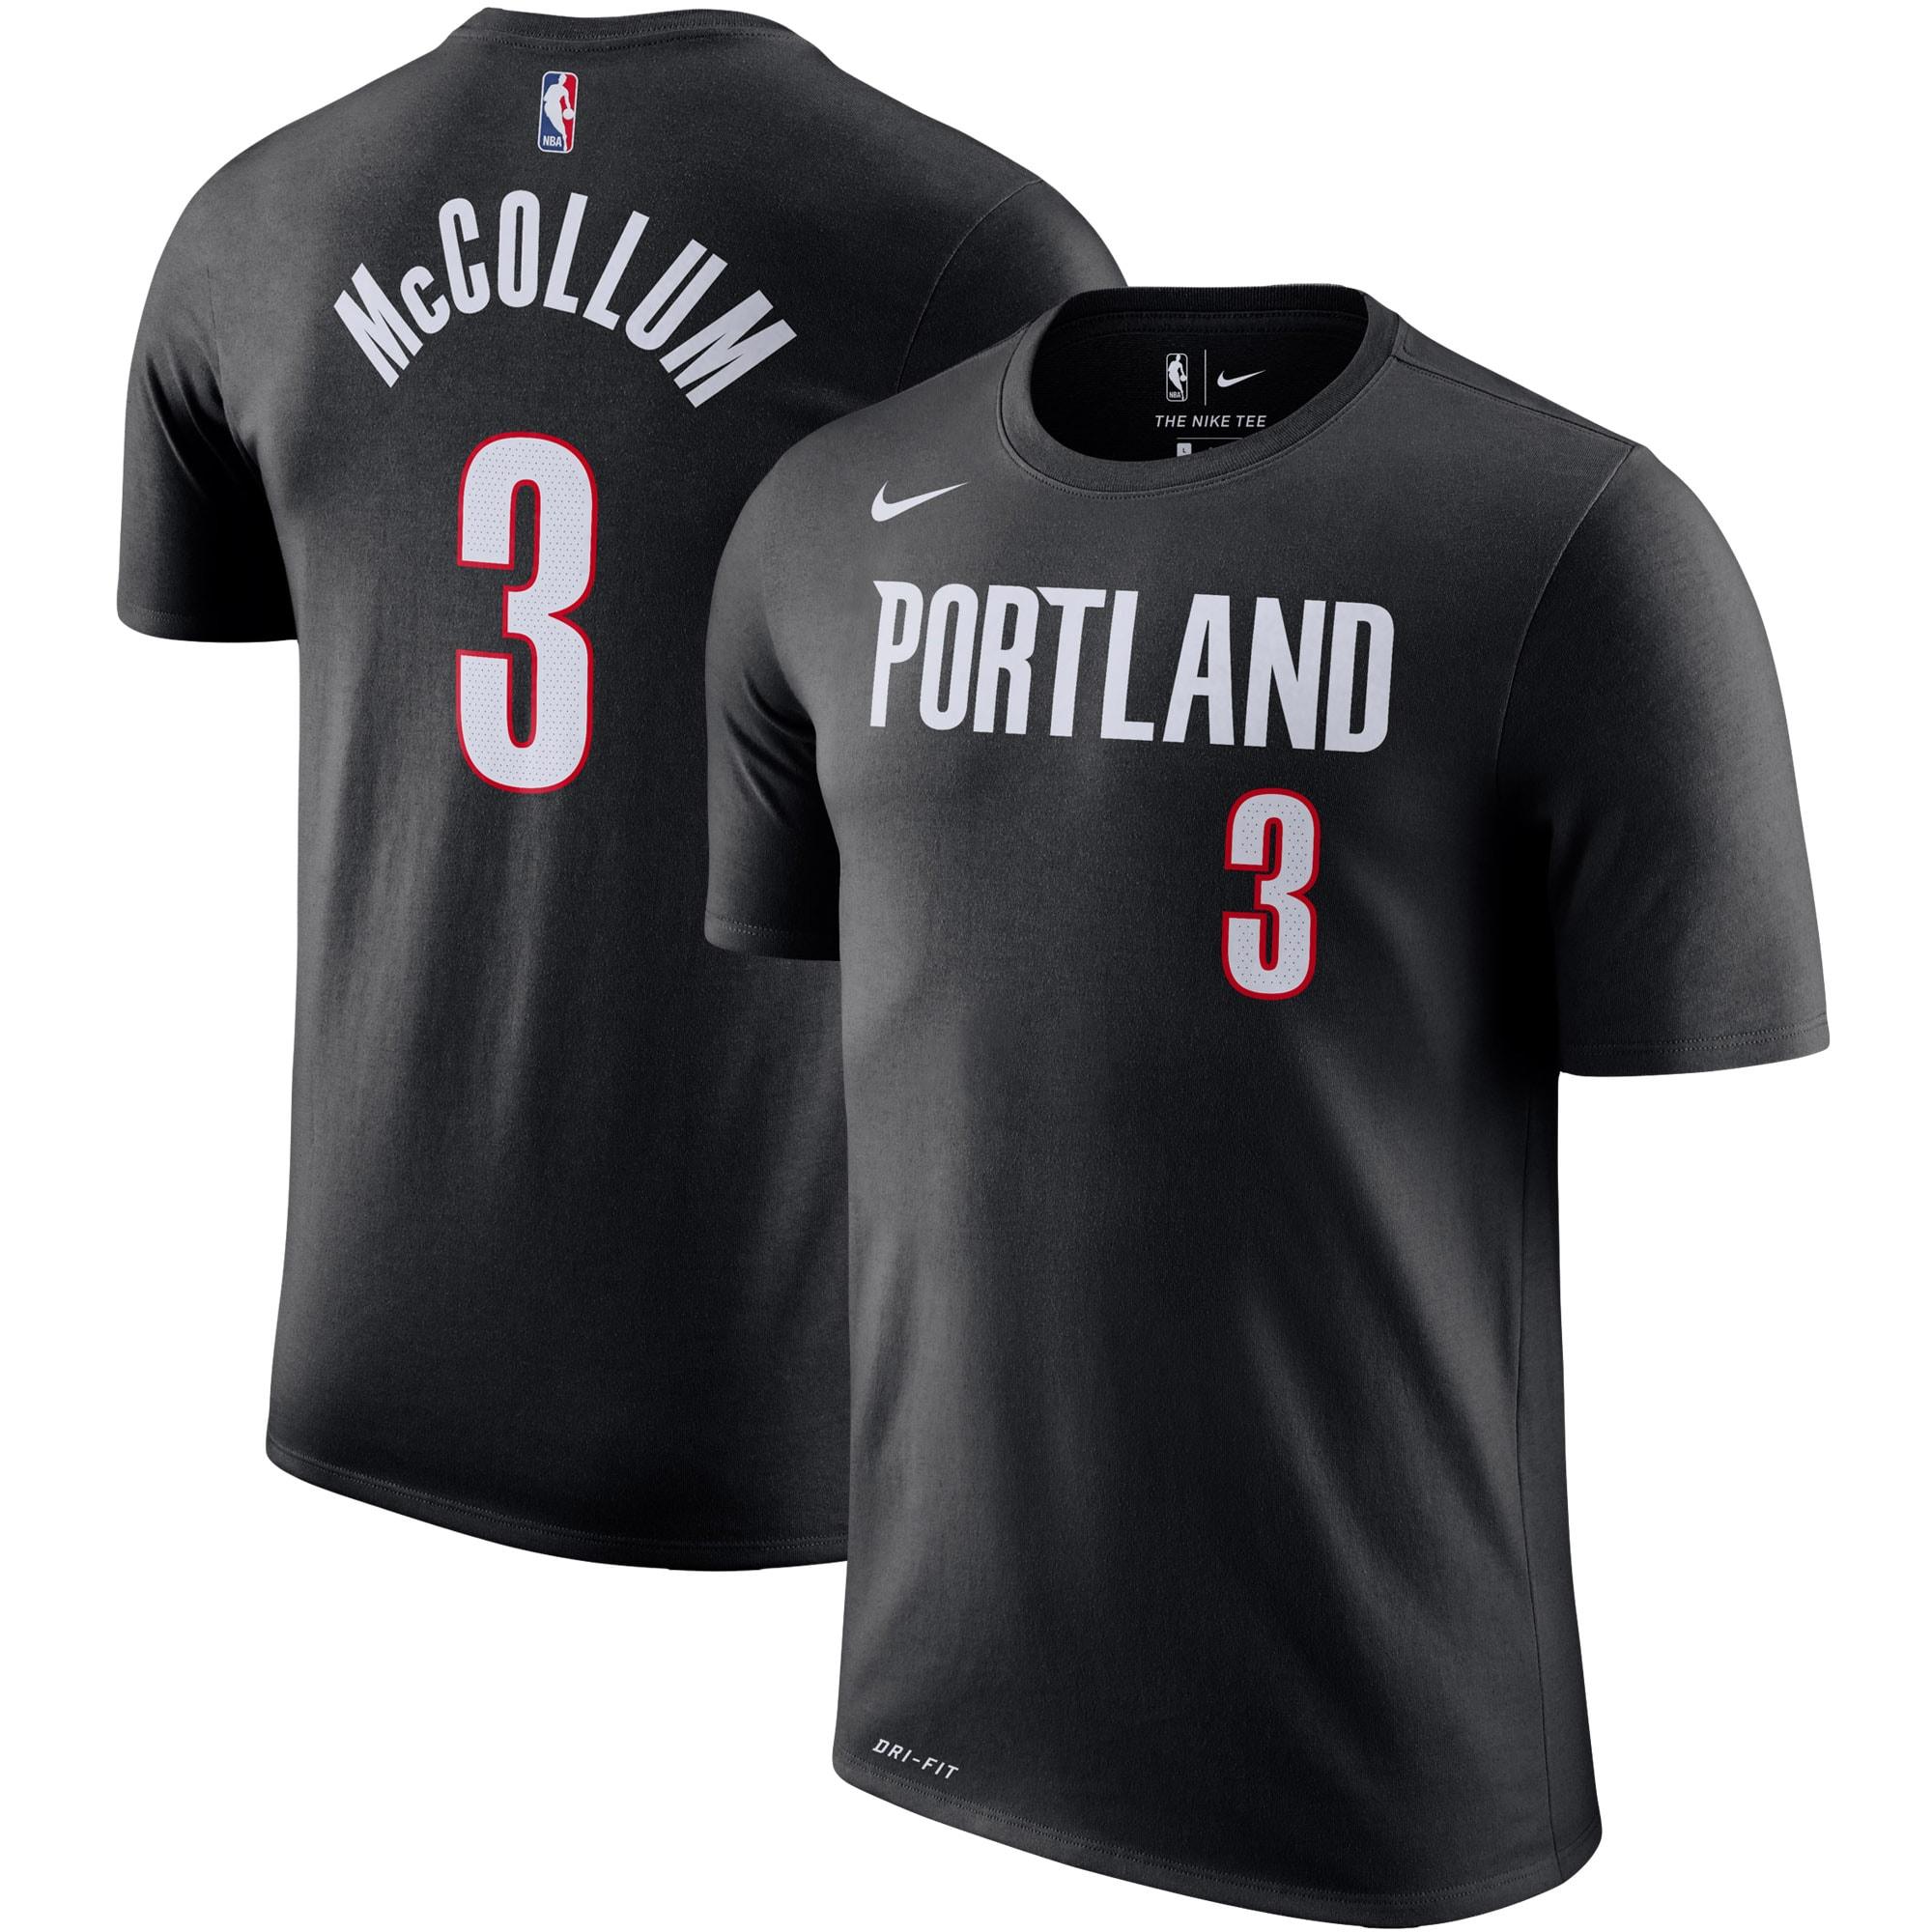 C.J. McCollum Portland Trail Blazers Nike Player Name & Number Performance T-Shirt - Black